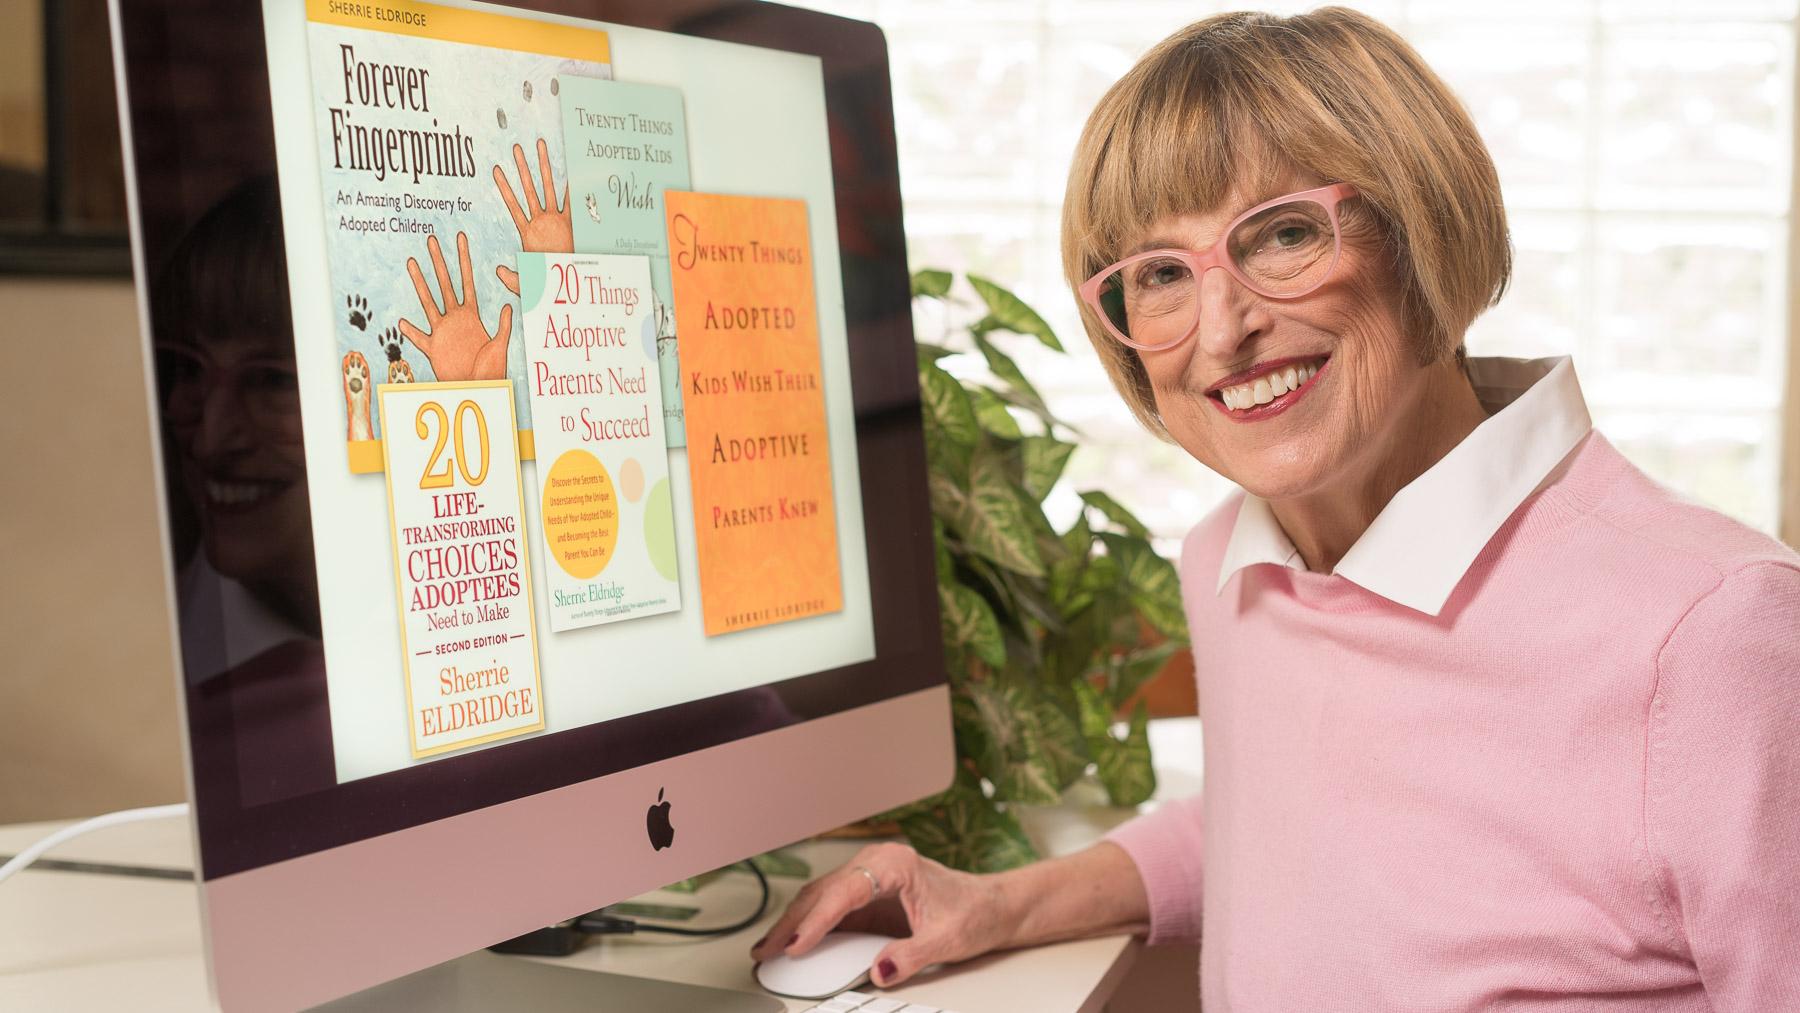 Adoption Author Sherrie Eldridge's 20 Things Adopted Kids Wish Series